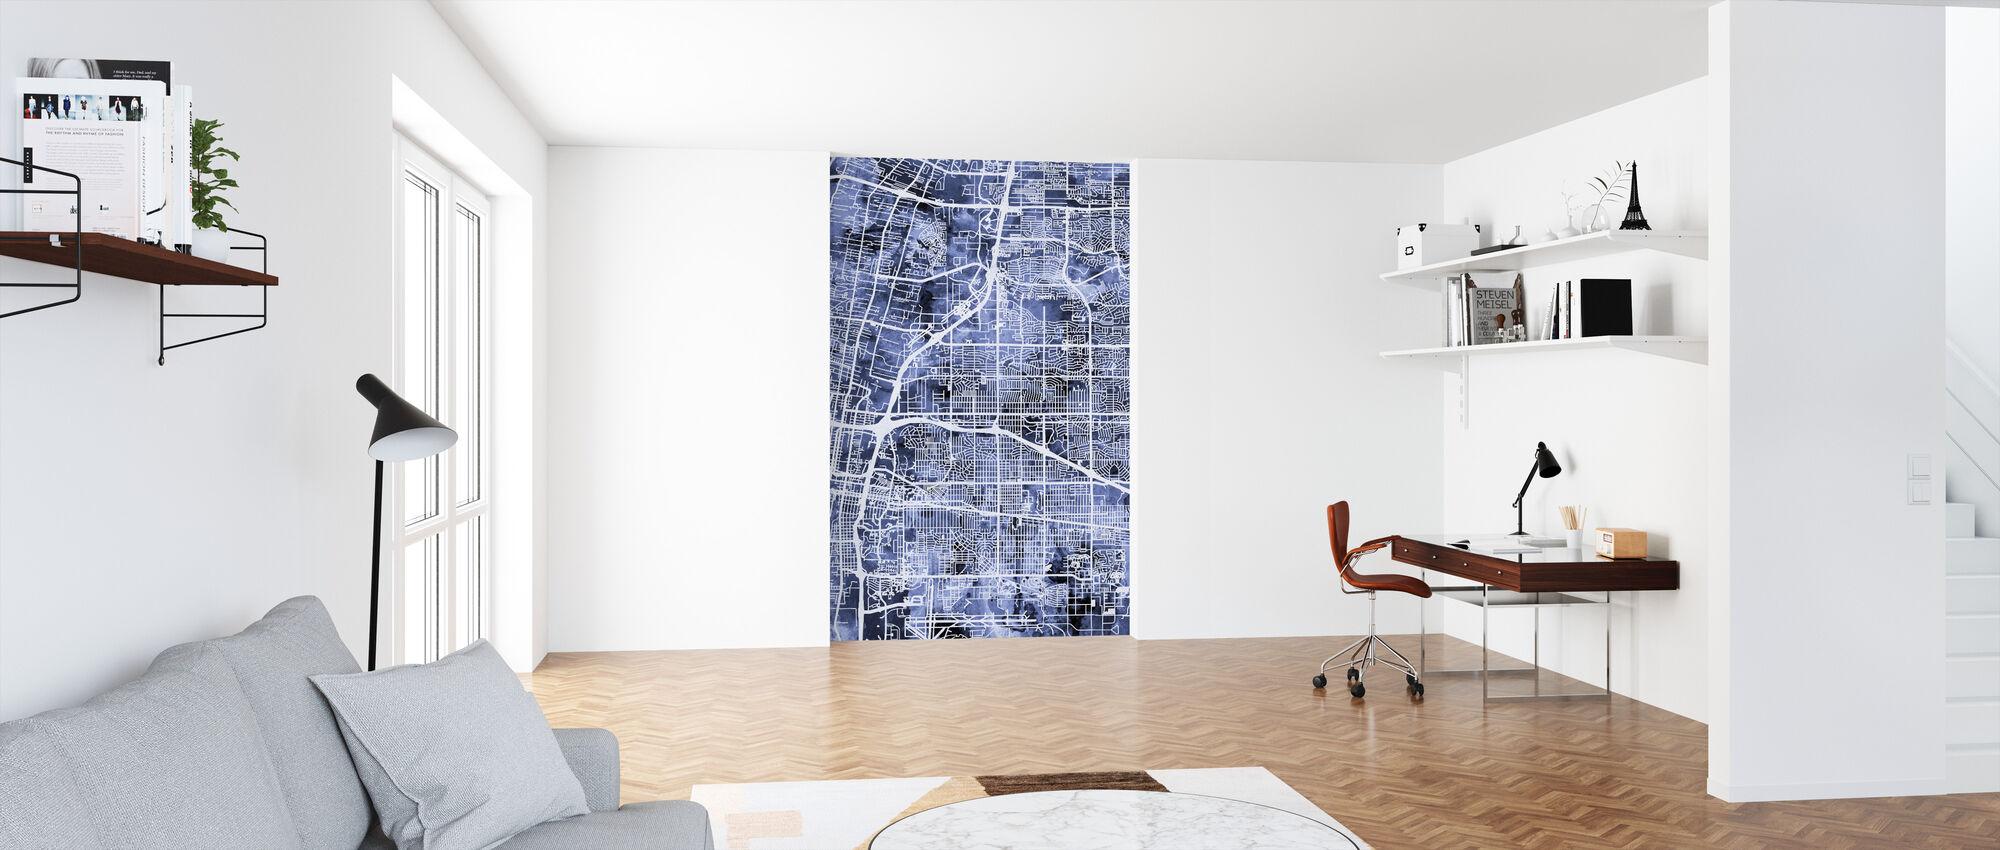 Albuquerque New Mexico City Street Map - Wallpaper - Office